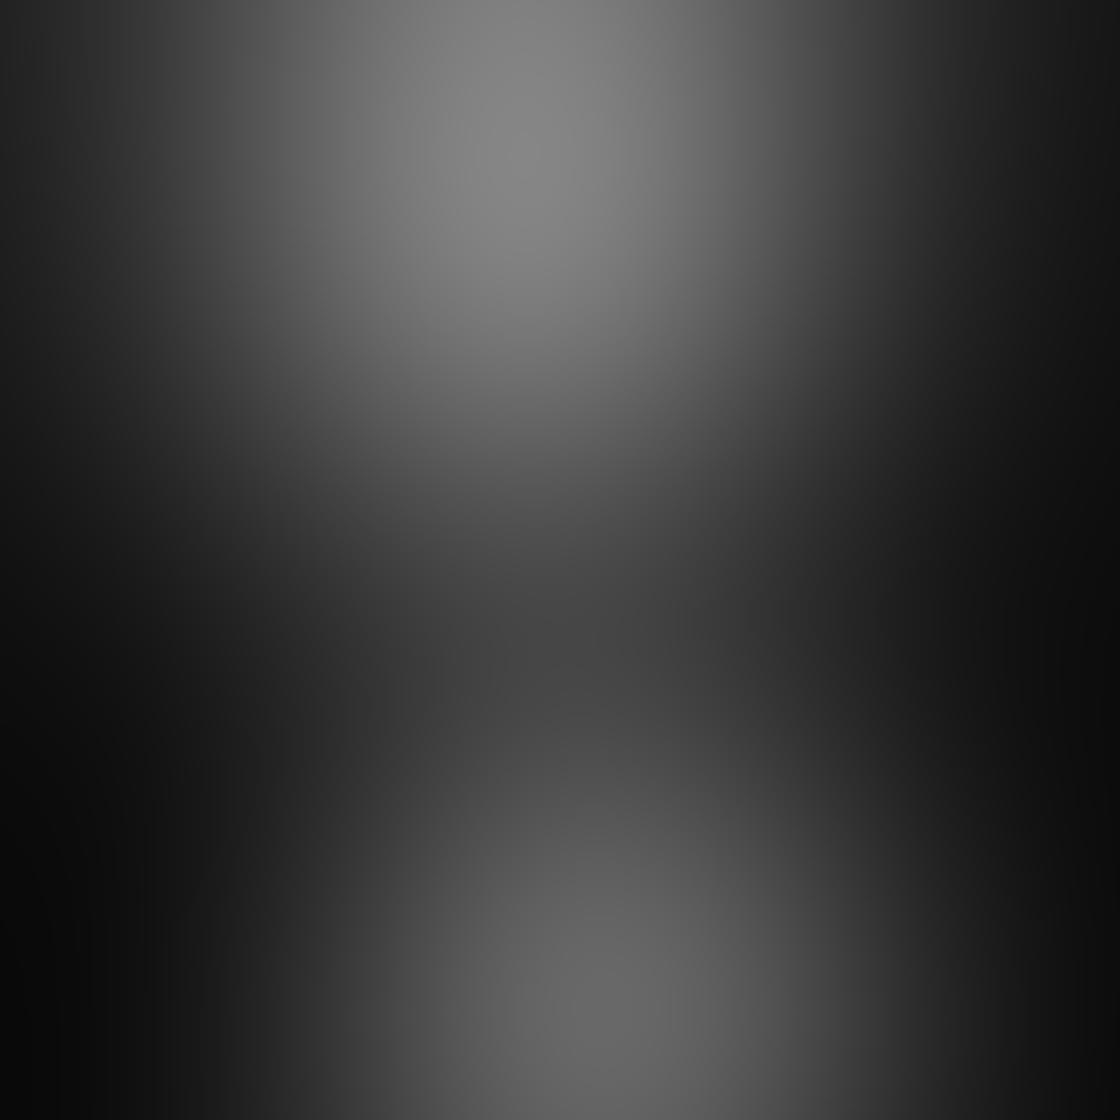 iPhone Photos Lens Flare 7